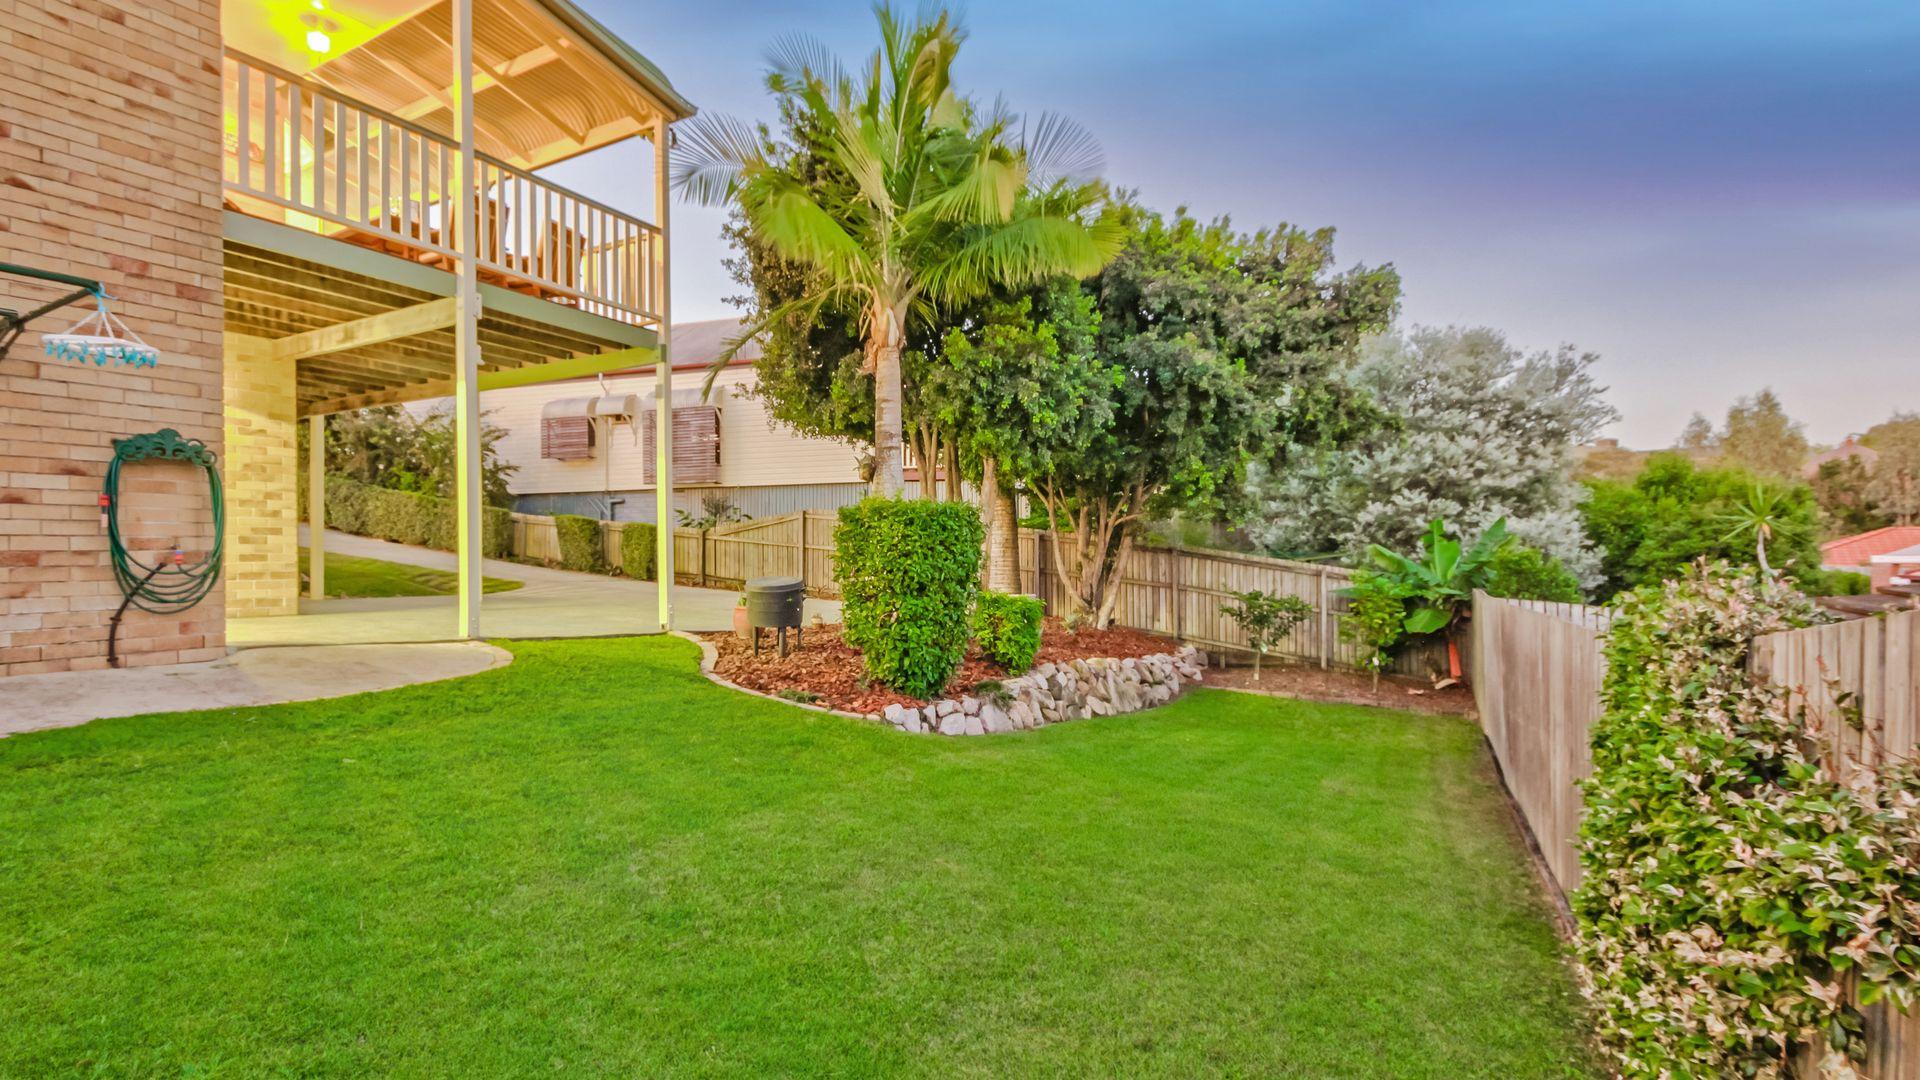 39 Hillenvale Avenue, Arana Hills QLD 4054, Image 1